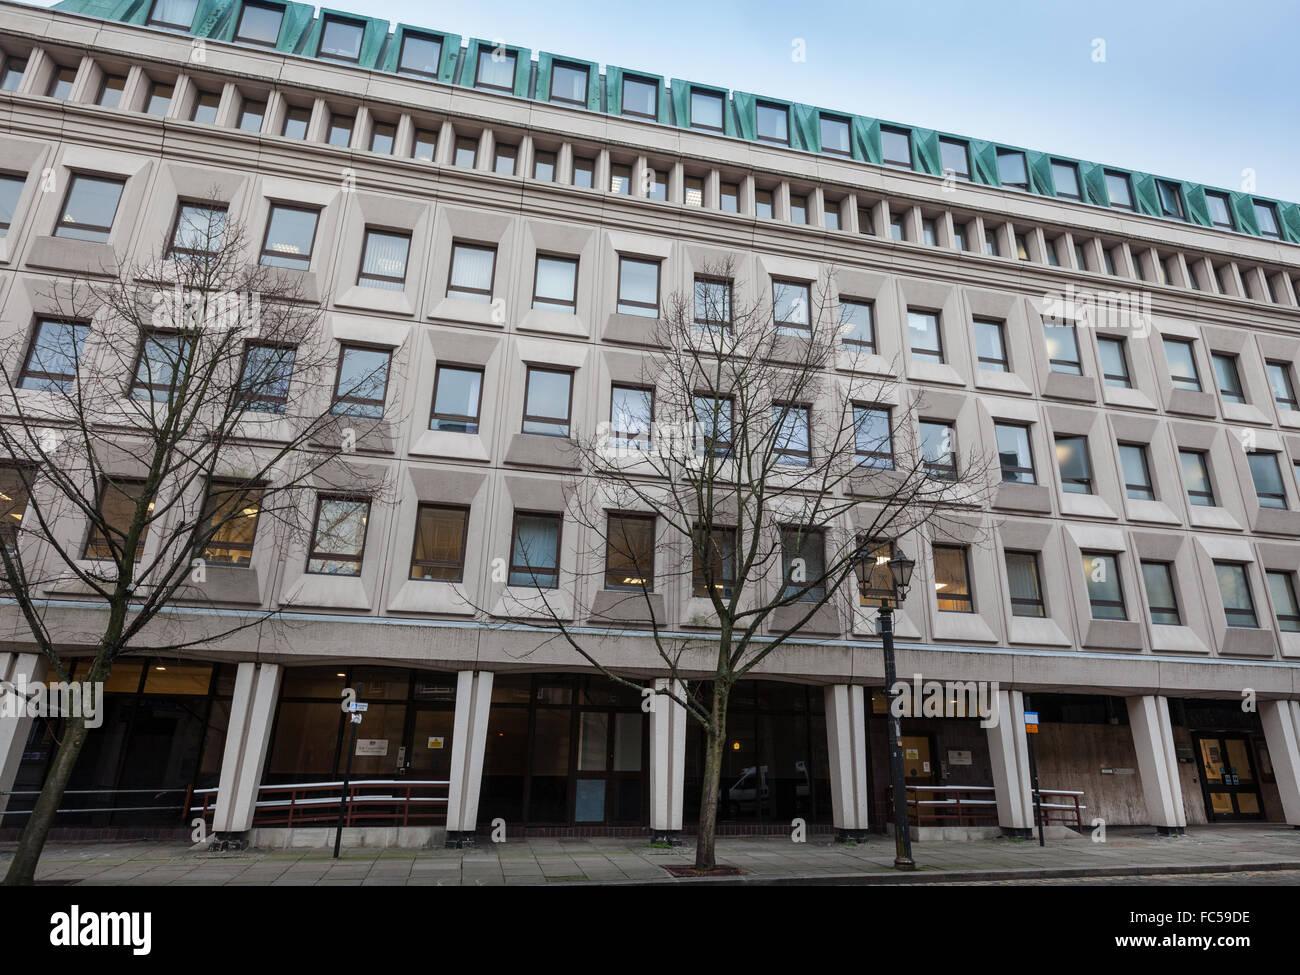 Bolton Coroners Court, Paderborn House, Bolton, UK - Stock Image